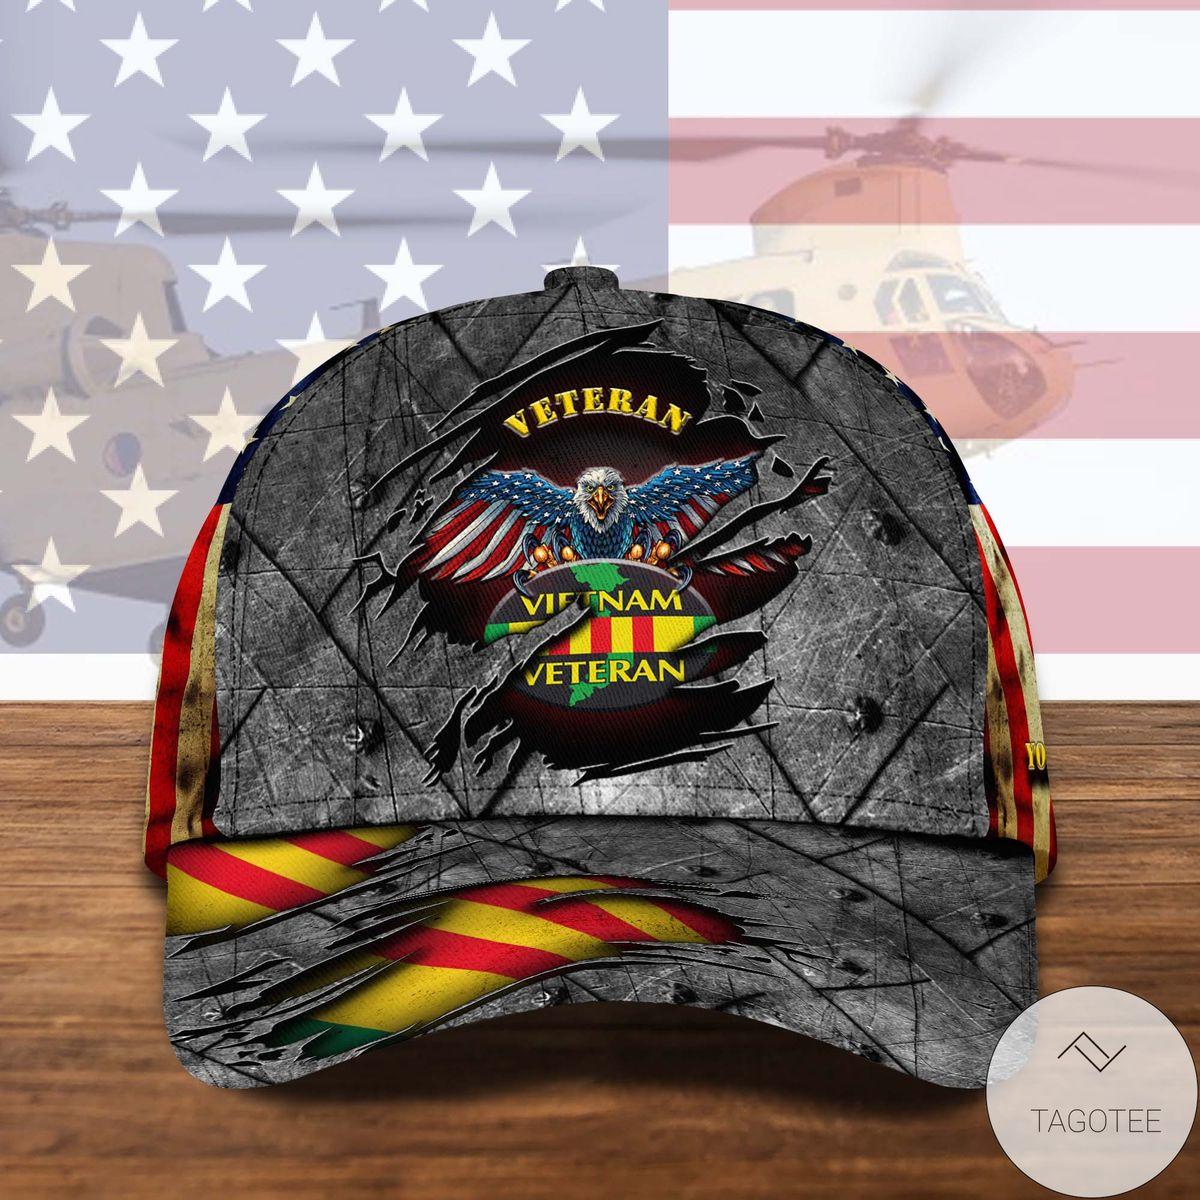 Personalized Vietnam Veteran Cap